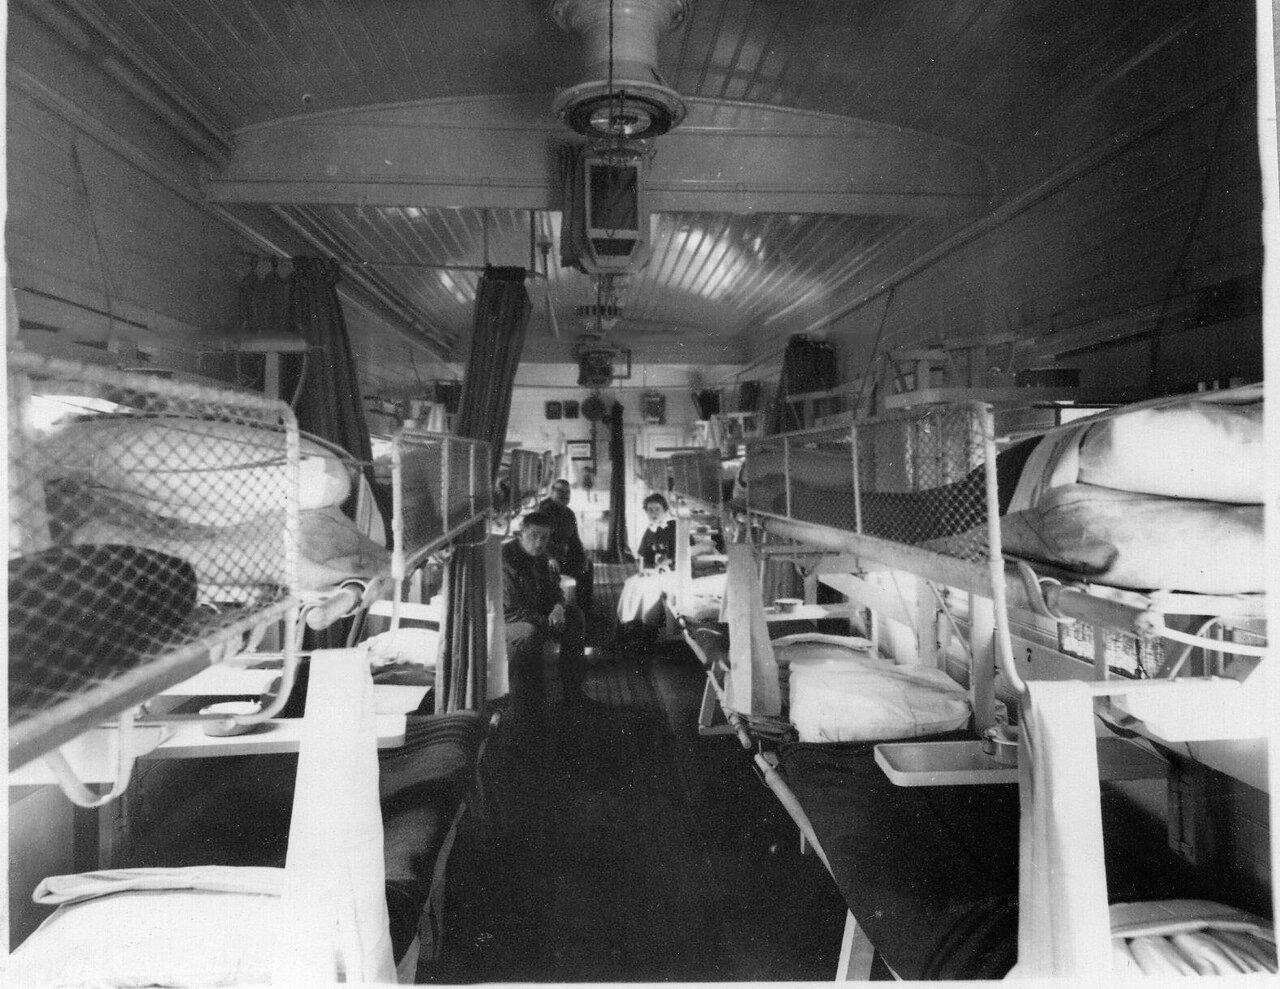 09. Внутренний вид вагона для тяжелораненых